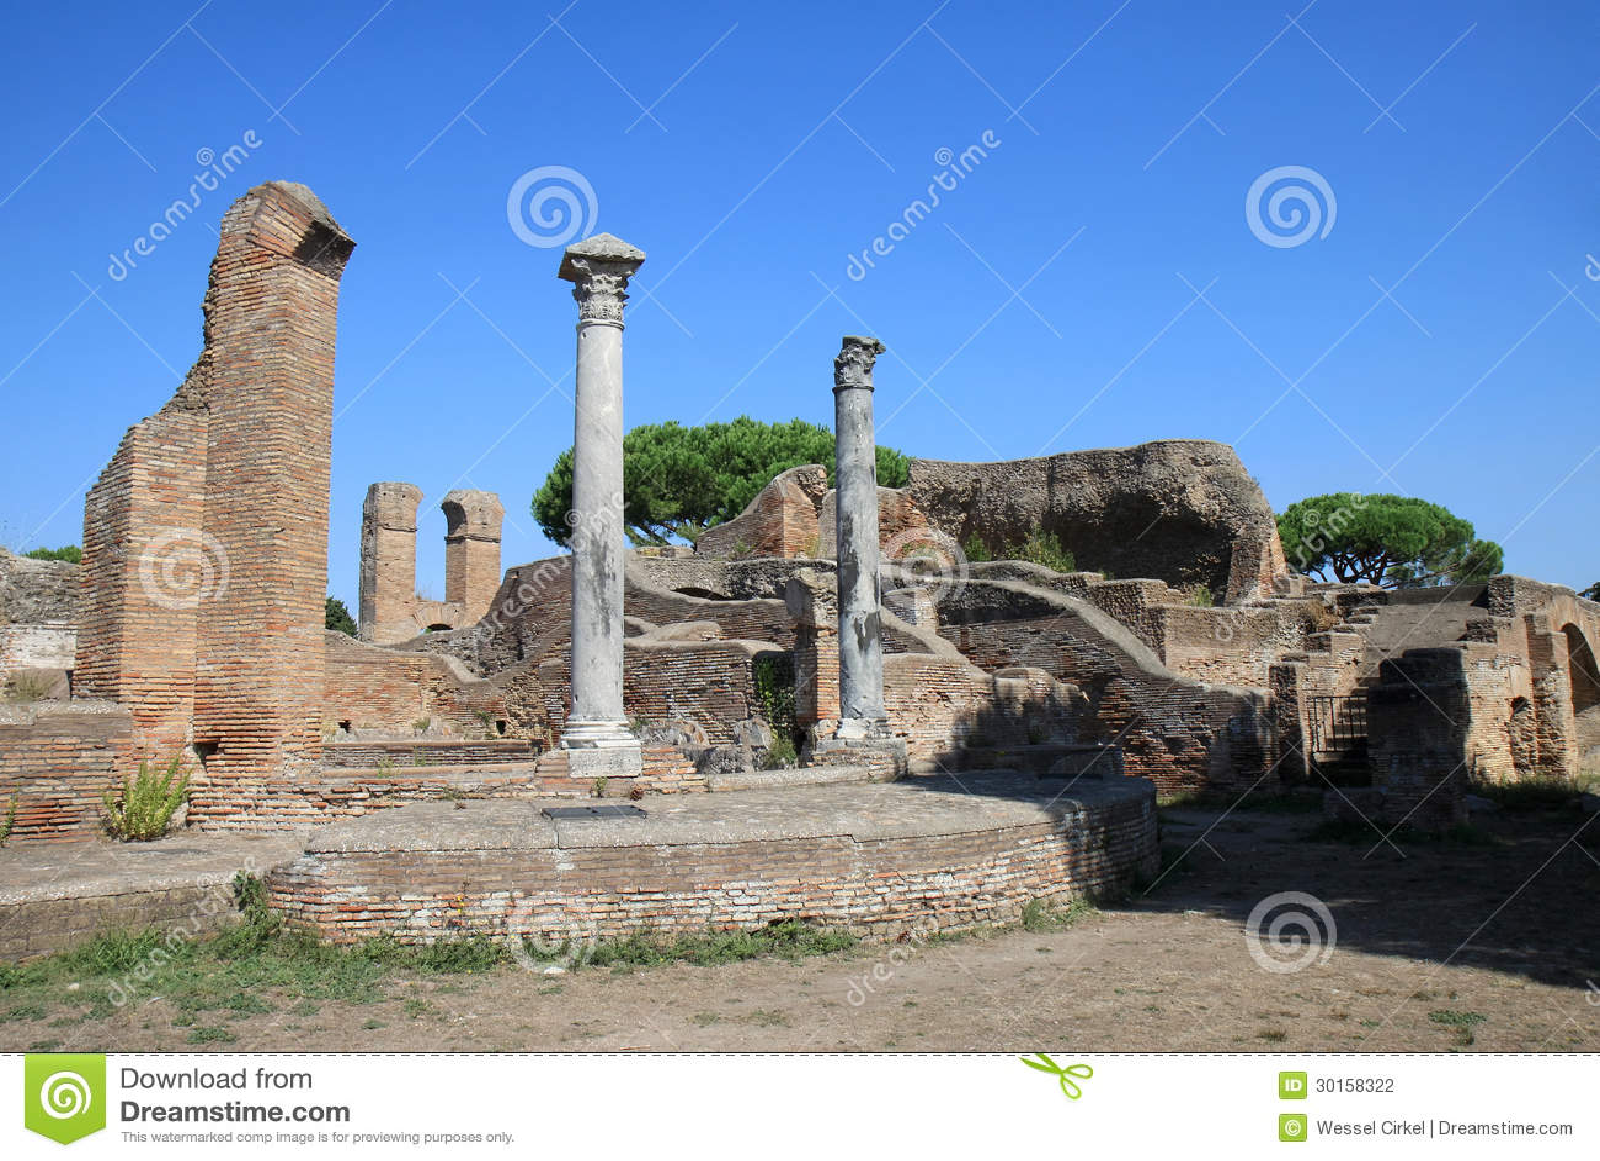 View over the palaestra in ostia antica italy stock for Mr arredamenti ostia antica